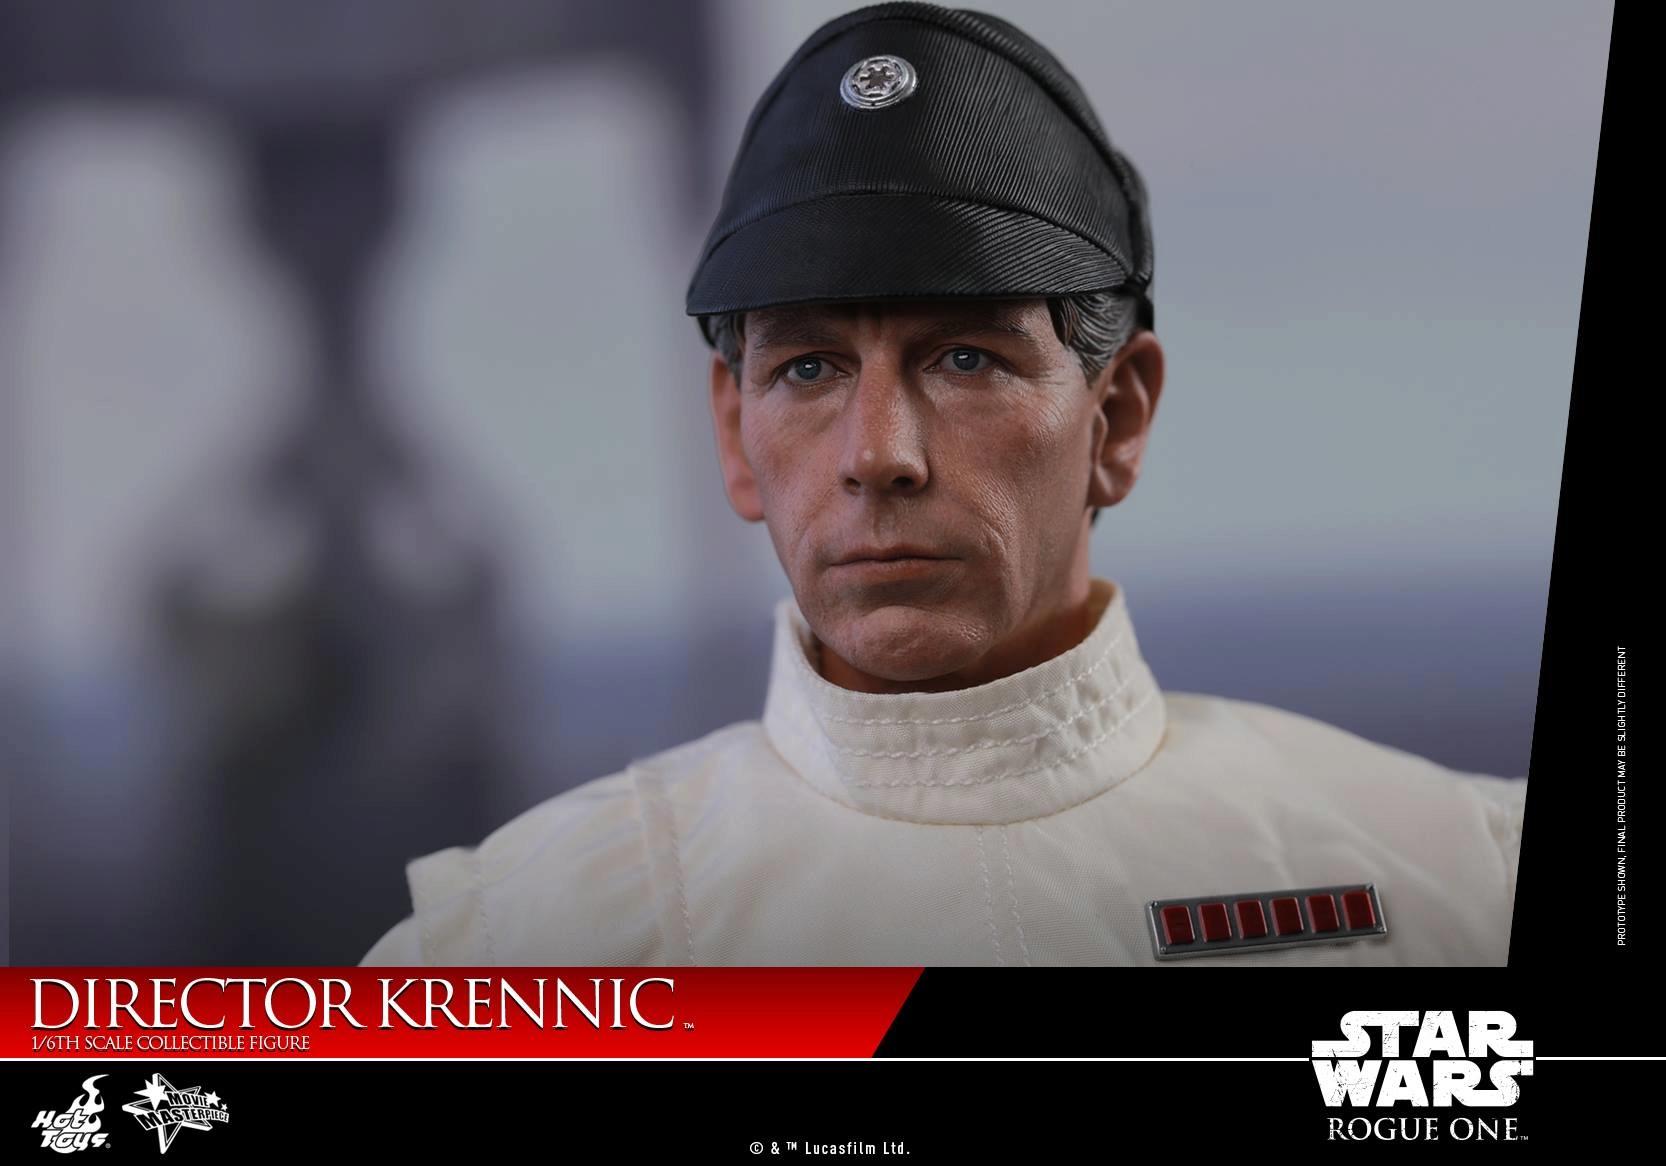 ROGUE ONE : A STAR WARS STORY - DIRECTOR KRENNIC - 10916